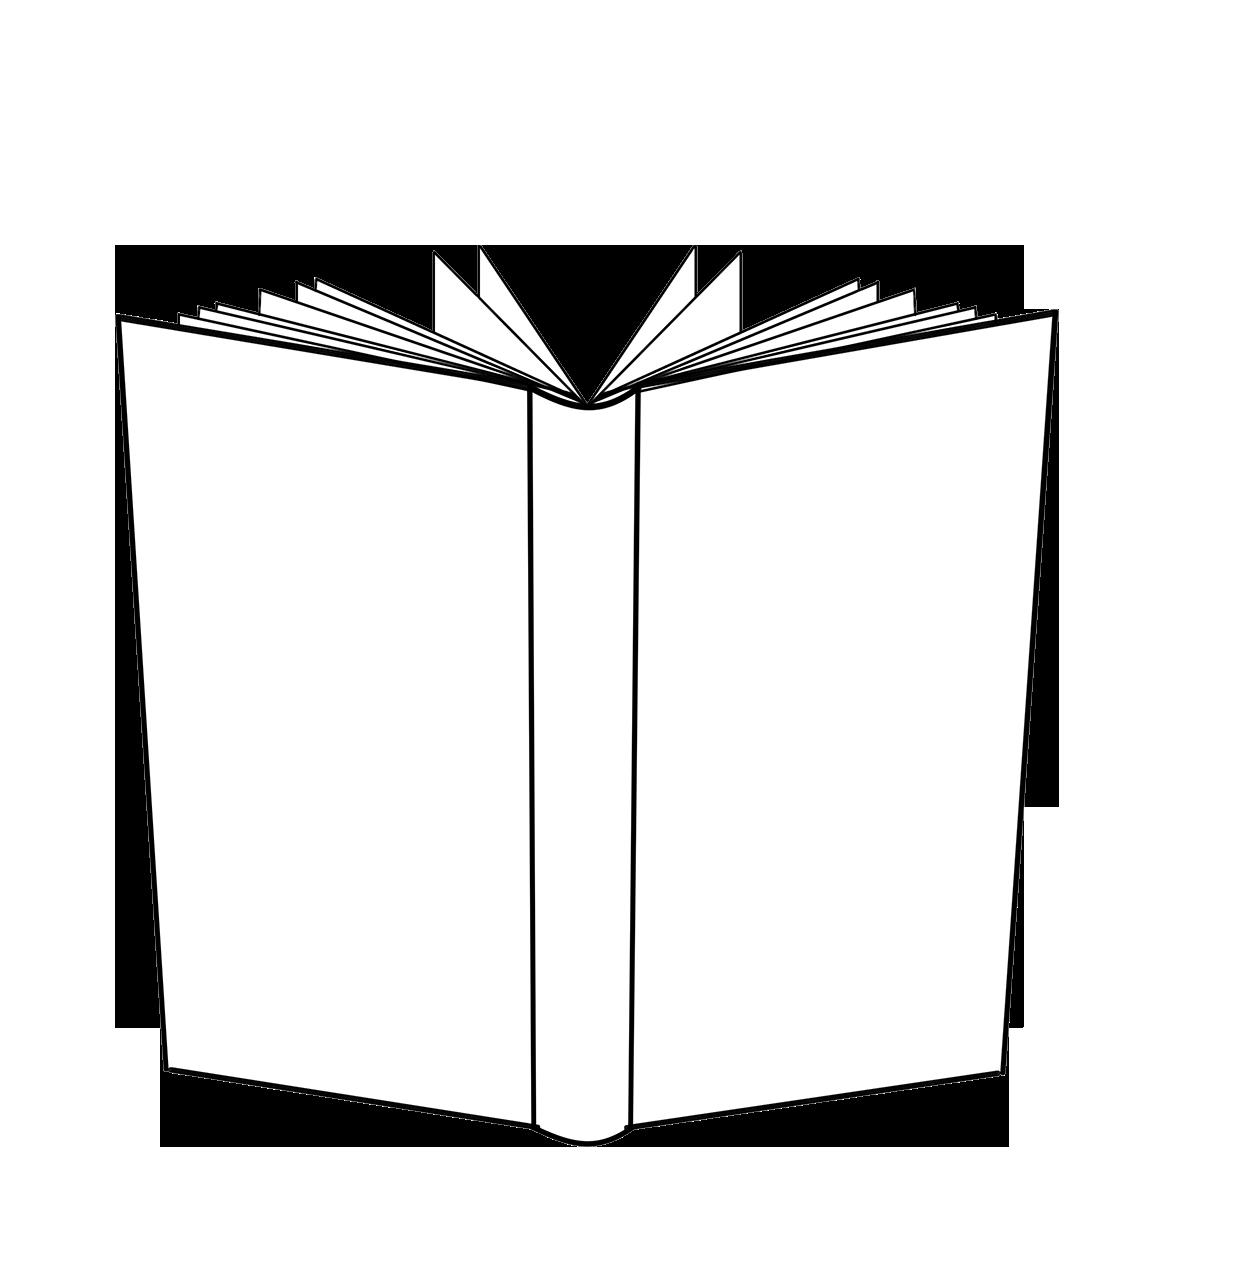 BOOK open backside